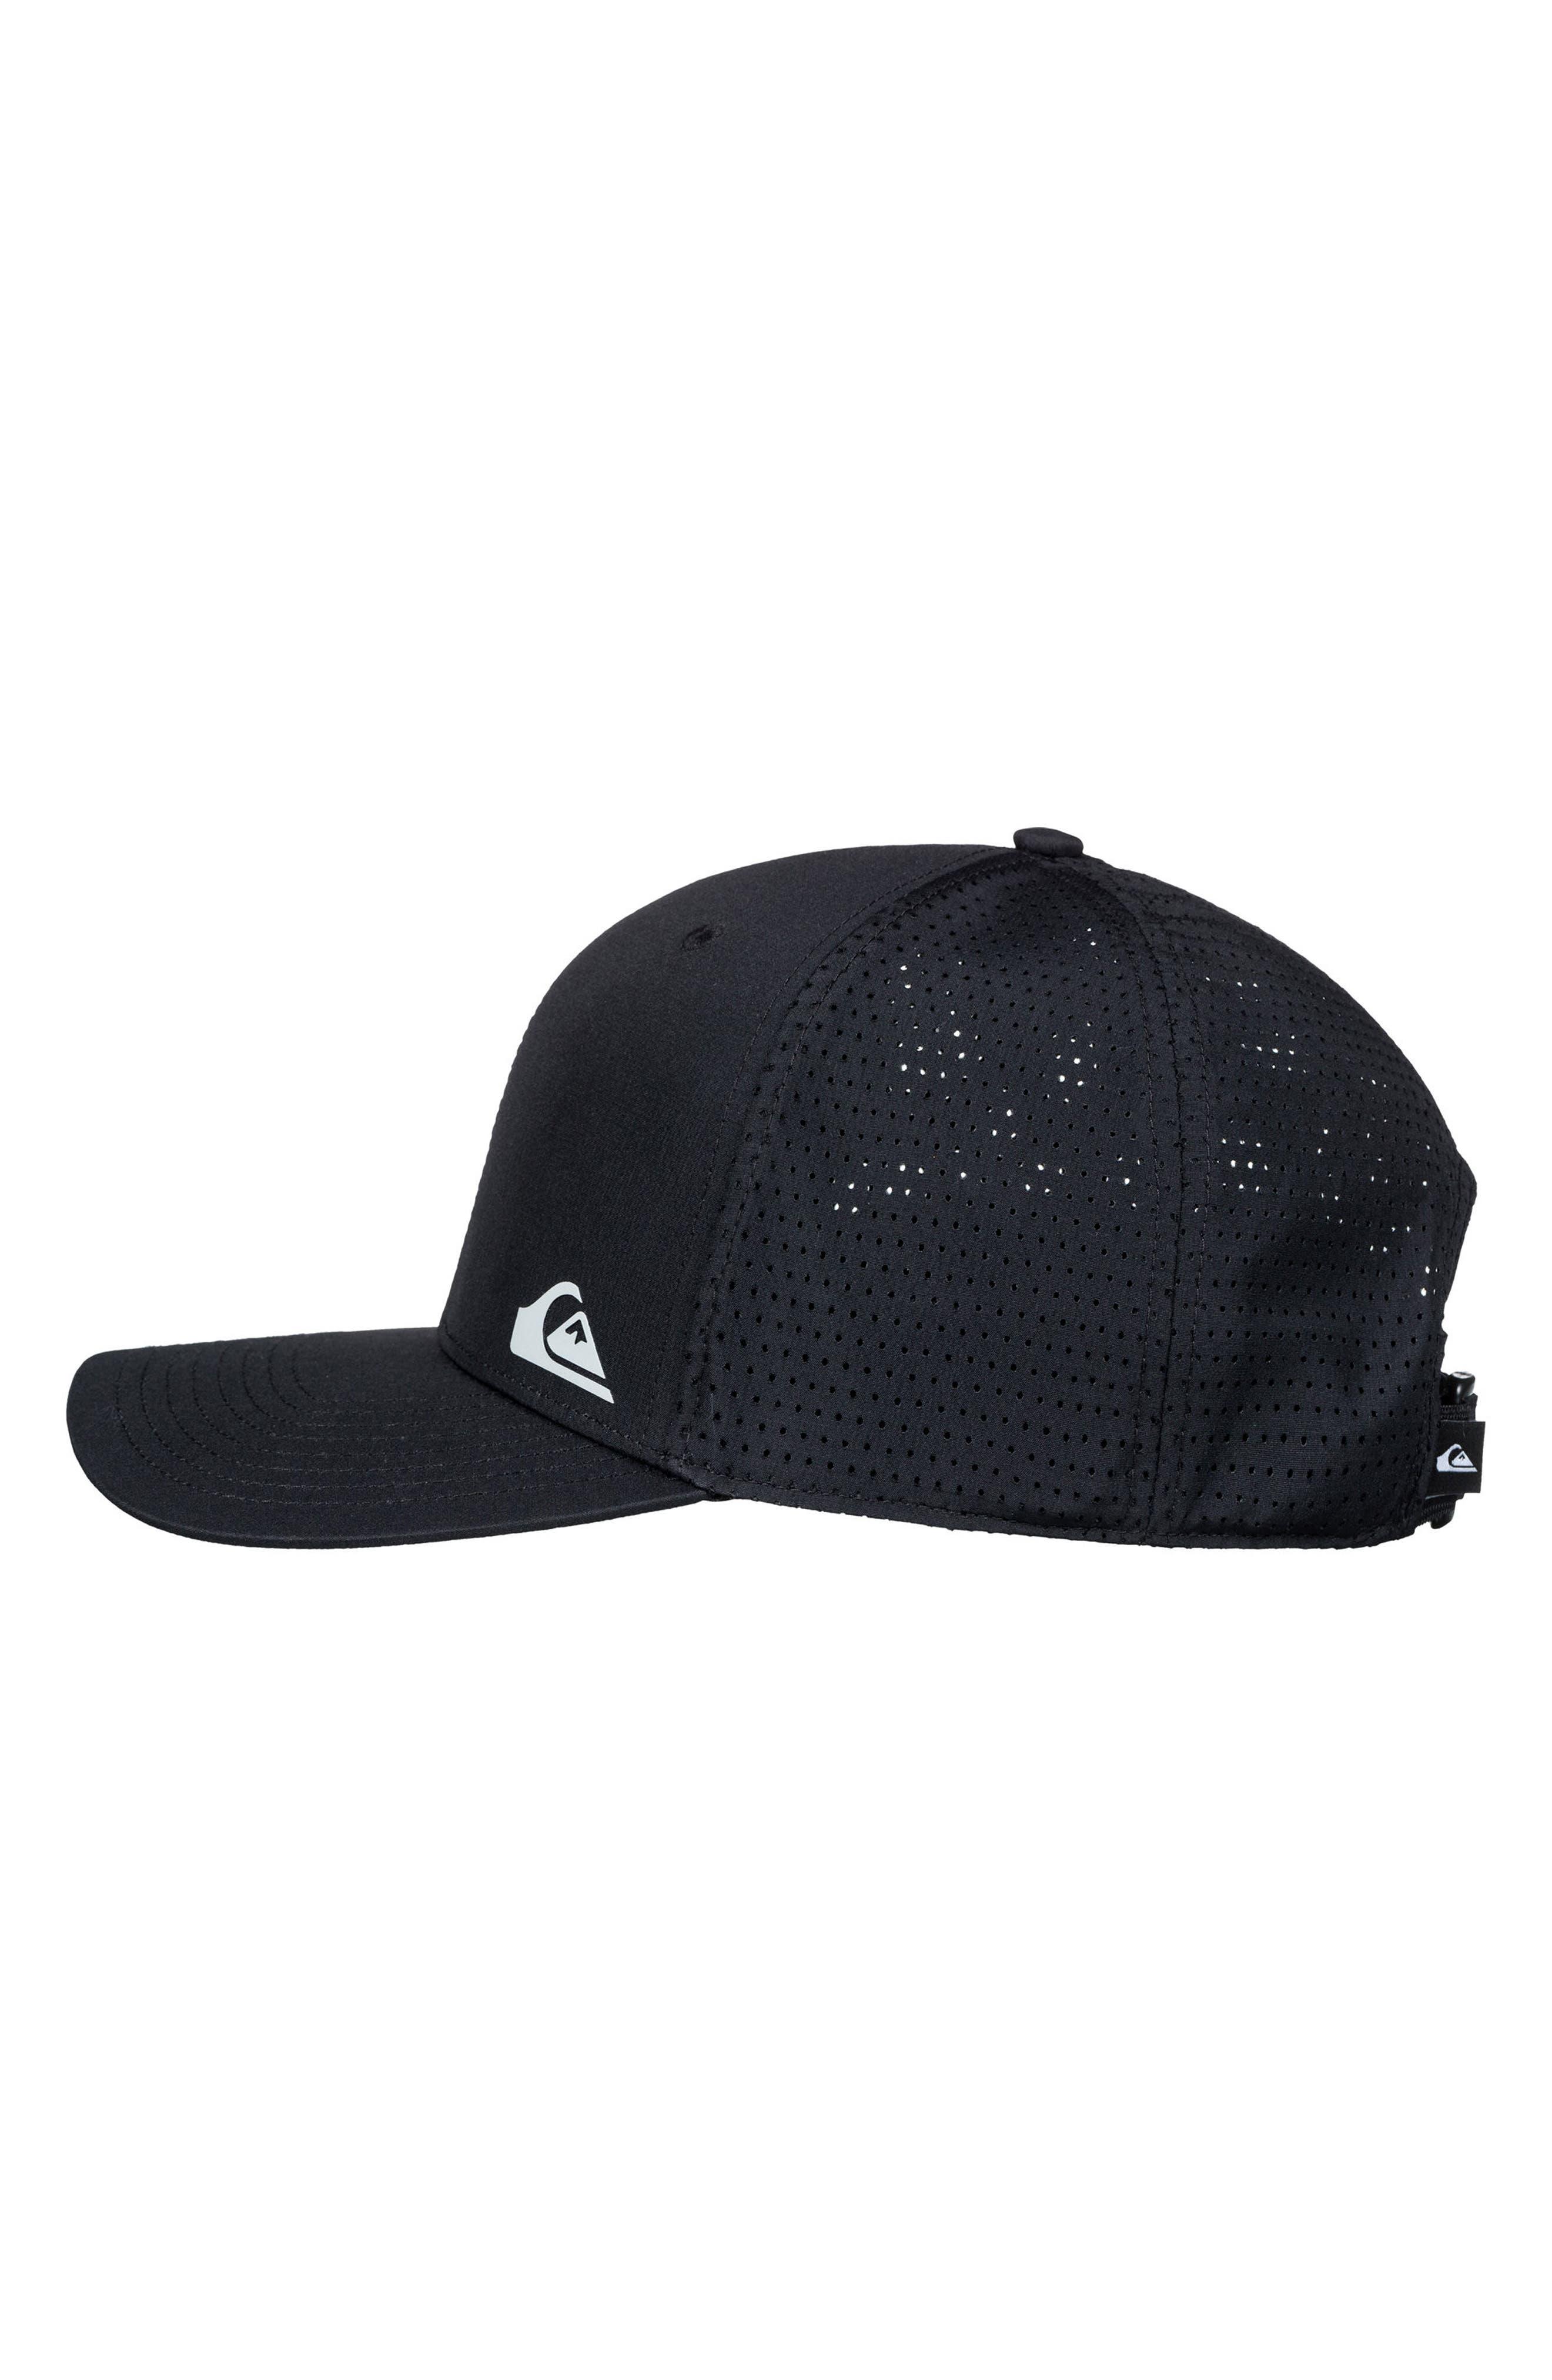 Technabutter Baseball Cap,                             Alternate thumbnail 2, color,                             Black